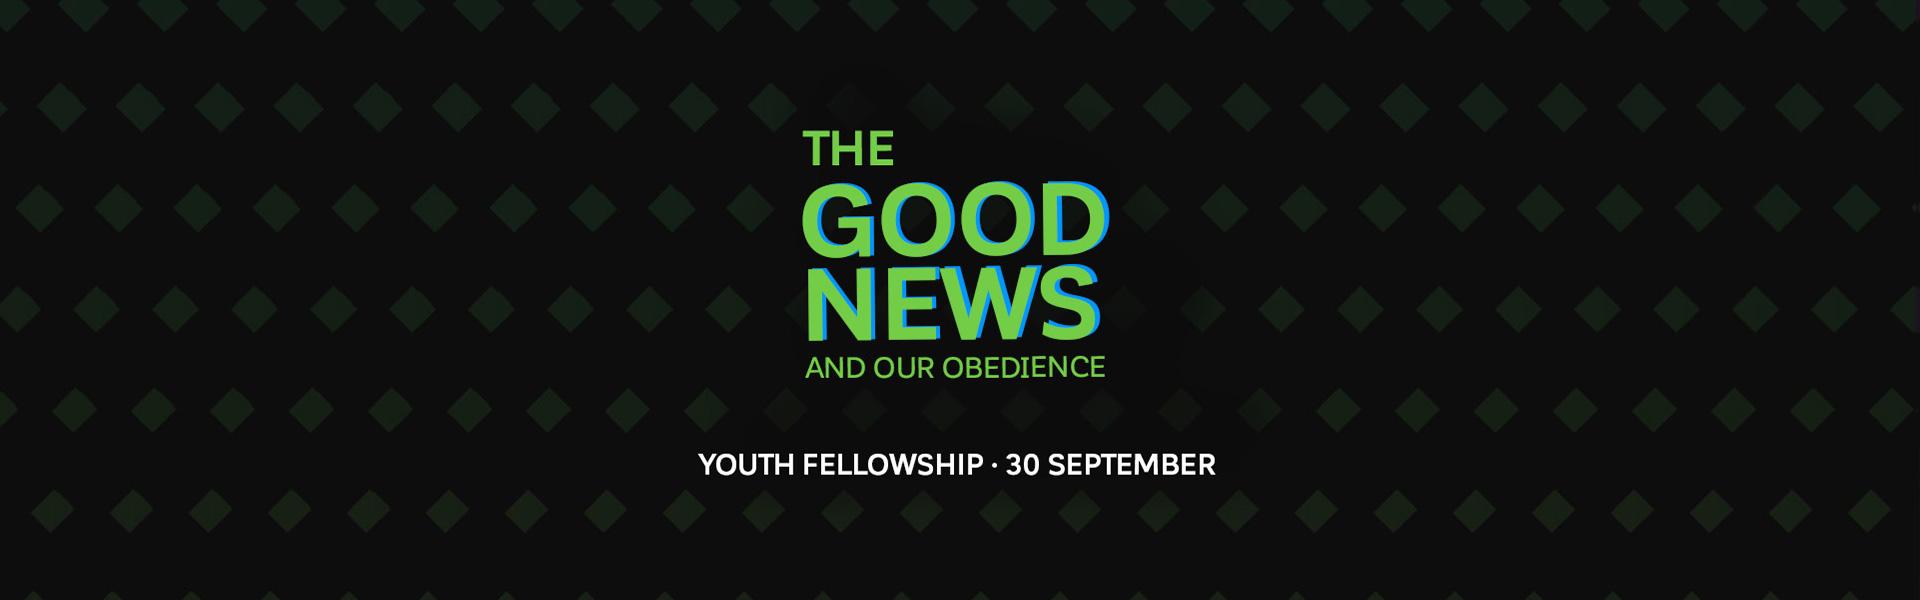 GoodNews2600